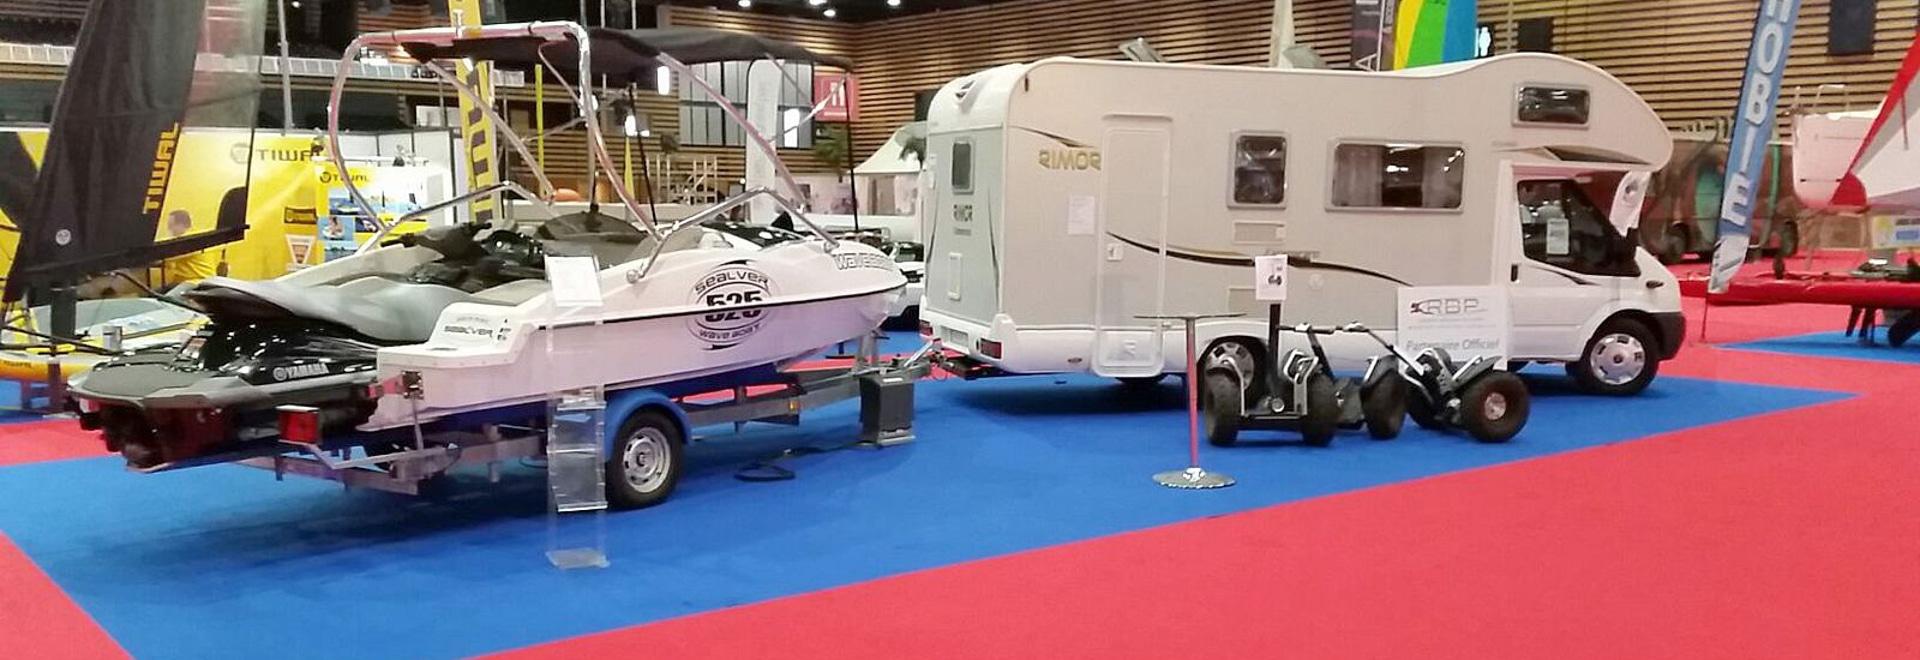 SEALVER at Loisirs d''eau Boat Show in Lyon (FR)